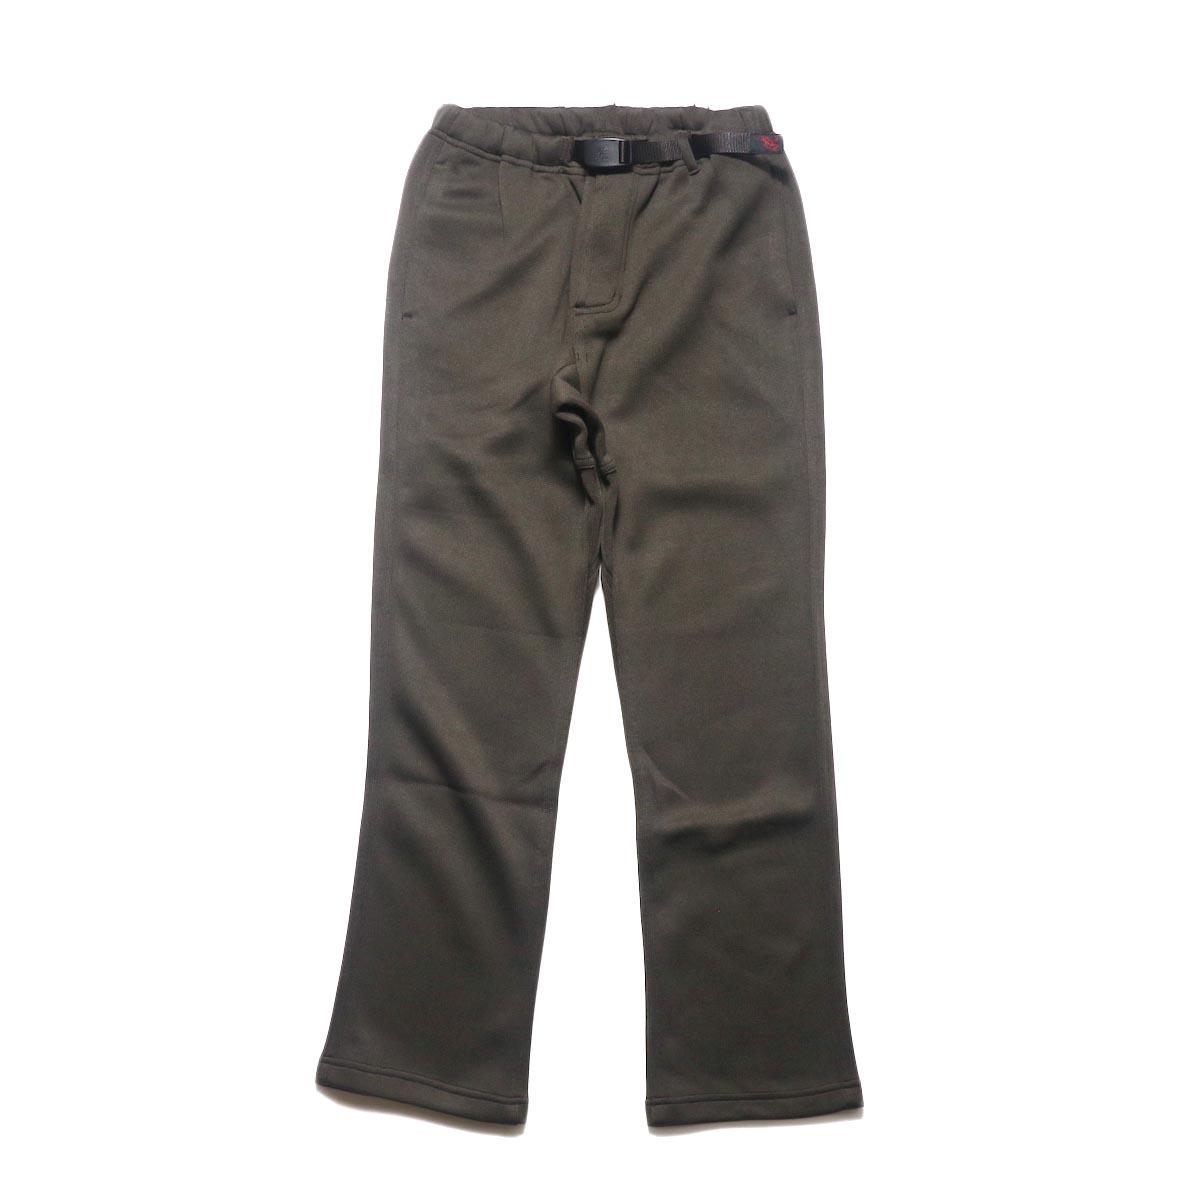 GRAMICCI / BONDING KNIT FLEECE NN-PANTS JUST CUT (Dark Brown)正面